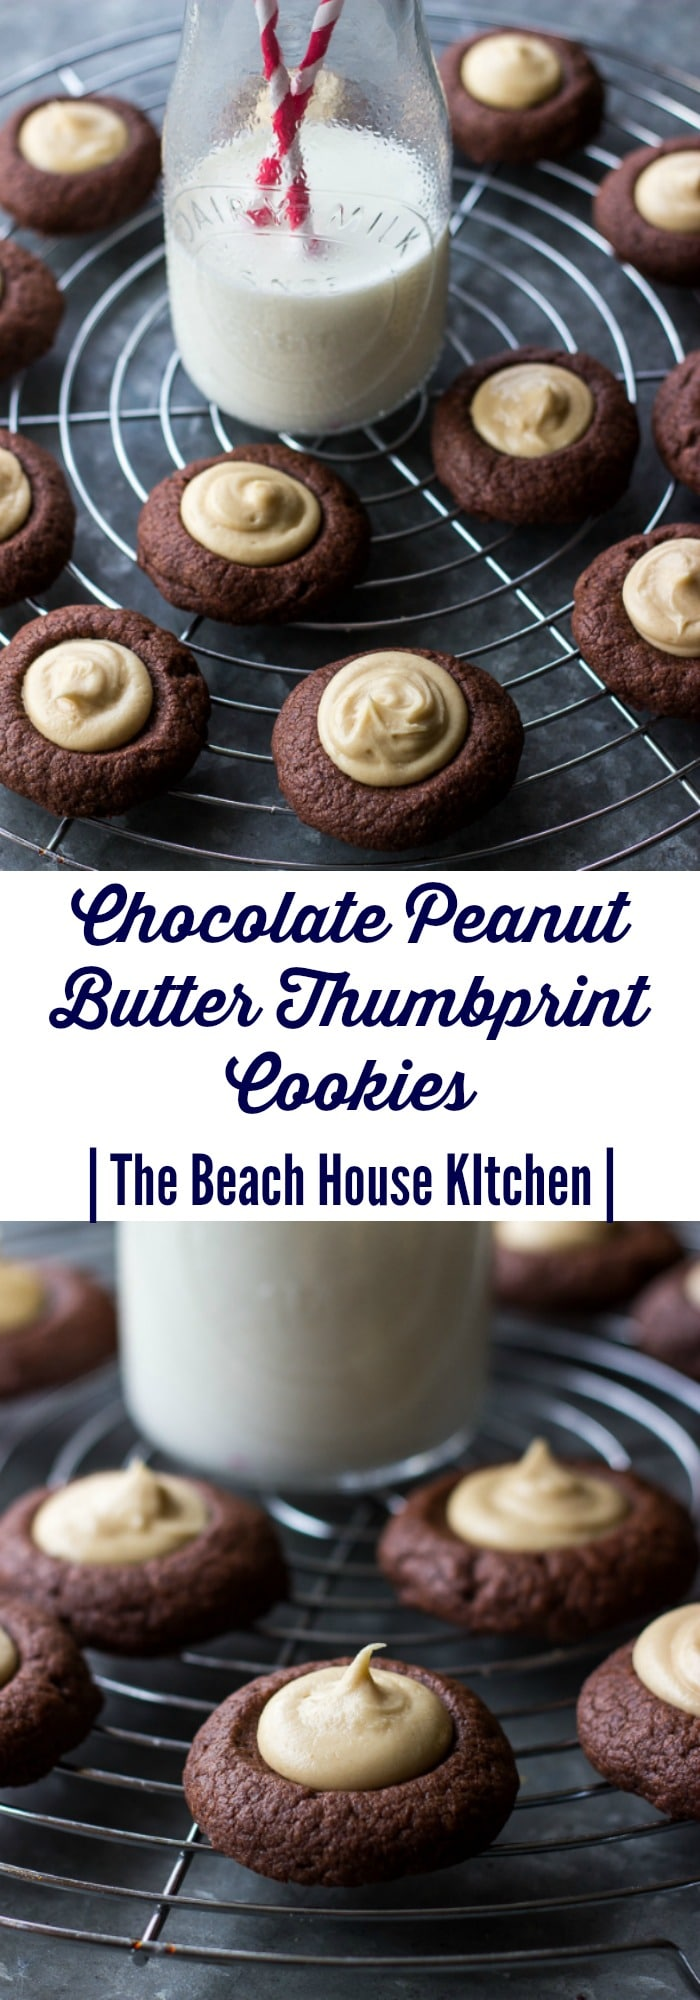 Chocolate Peanut ButterThumbprint Cookies